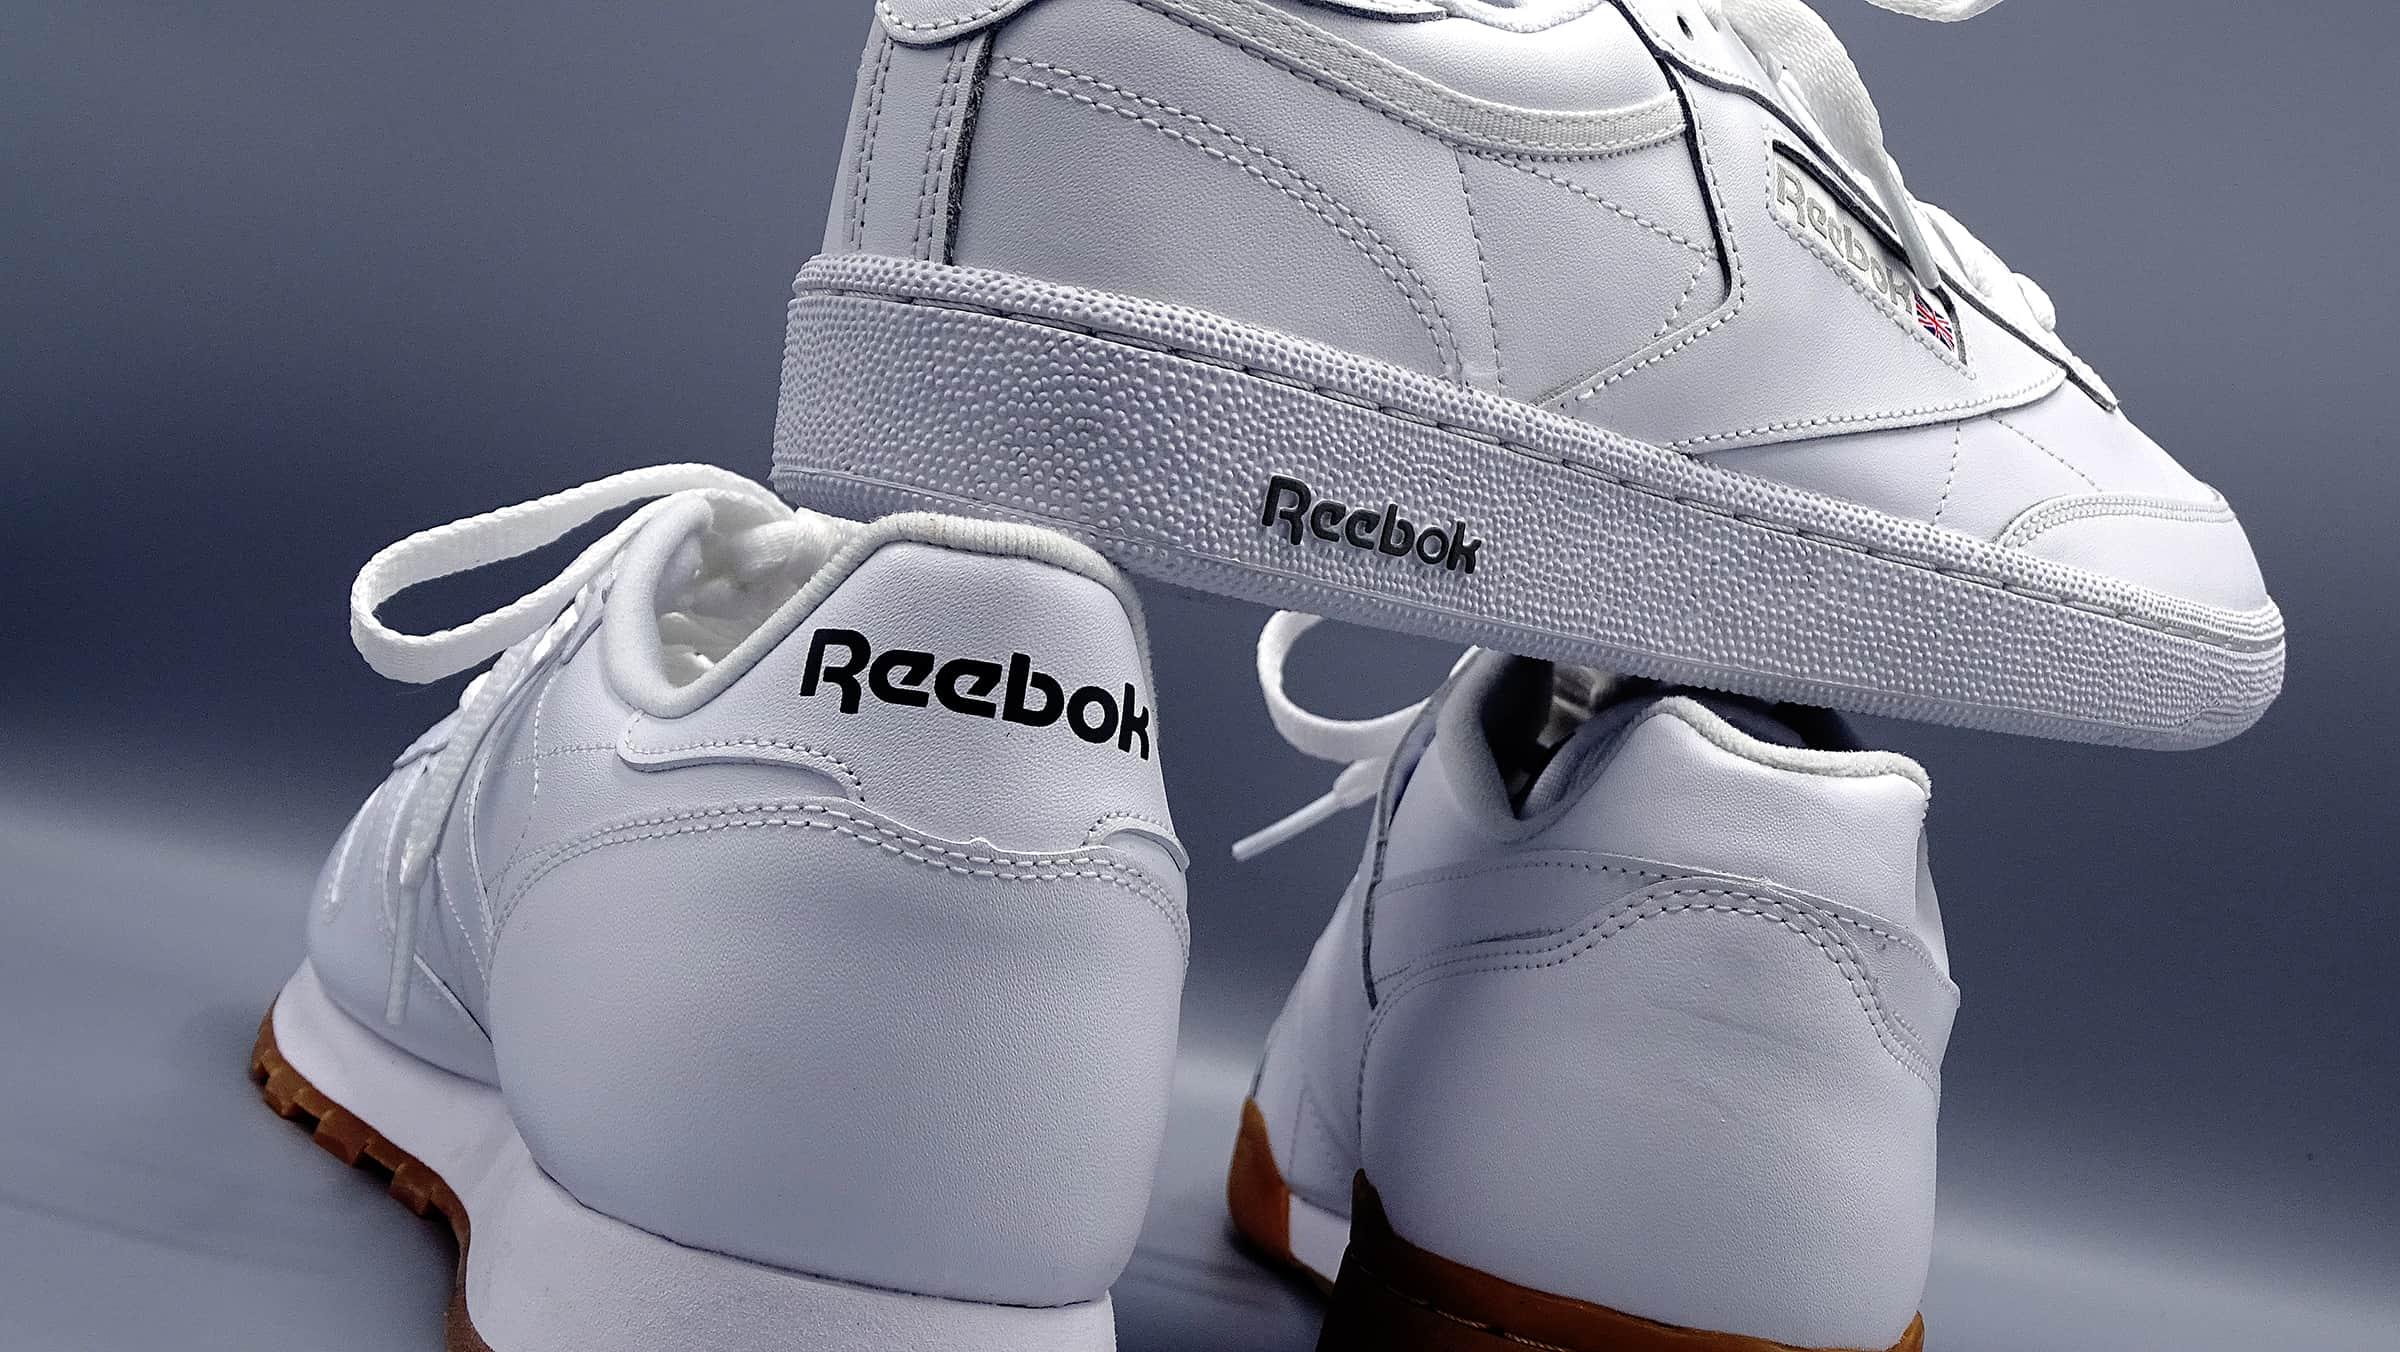 men's white reebok sneakers stacked